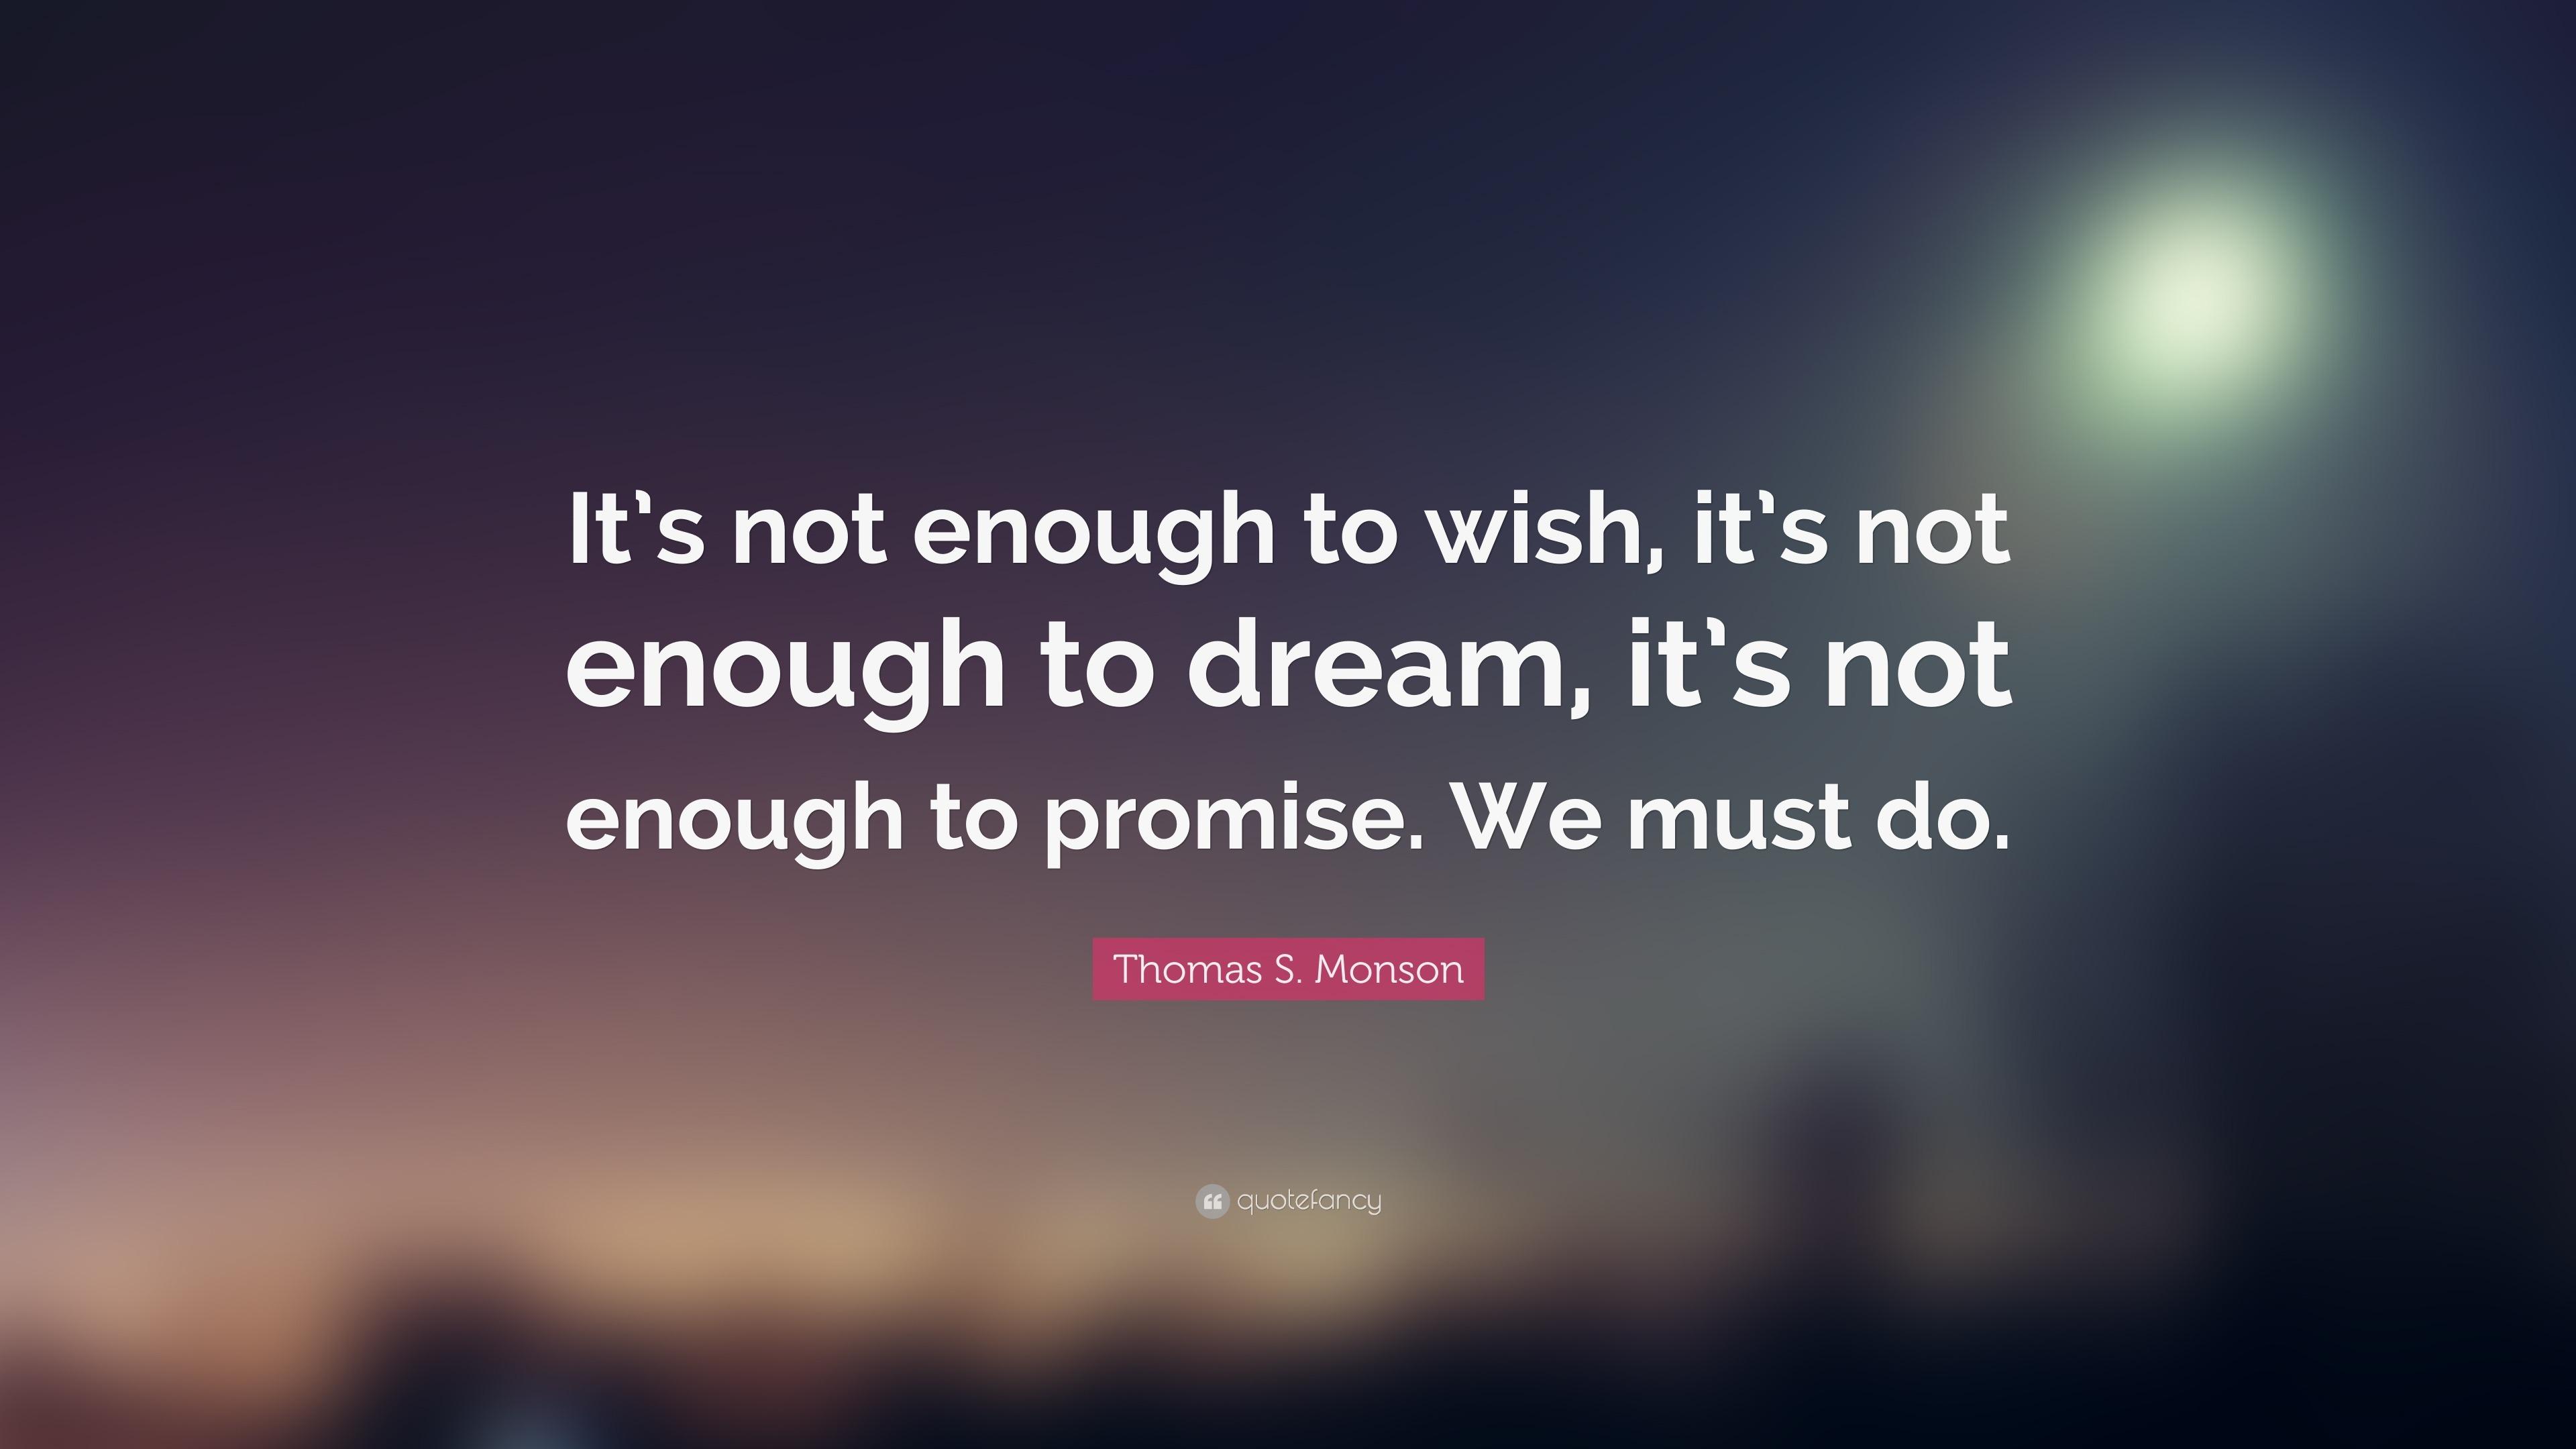 Thomas S. Monson Quote: U201cItu0027s Not Enough To Wish, Itu0027s Not Enough